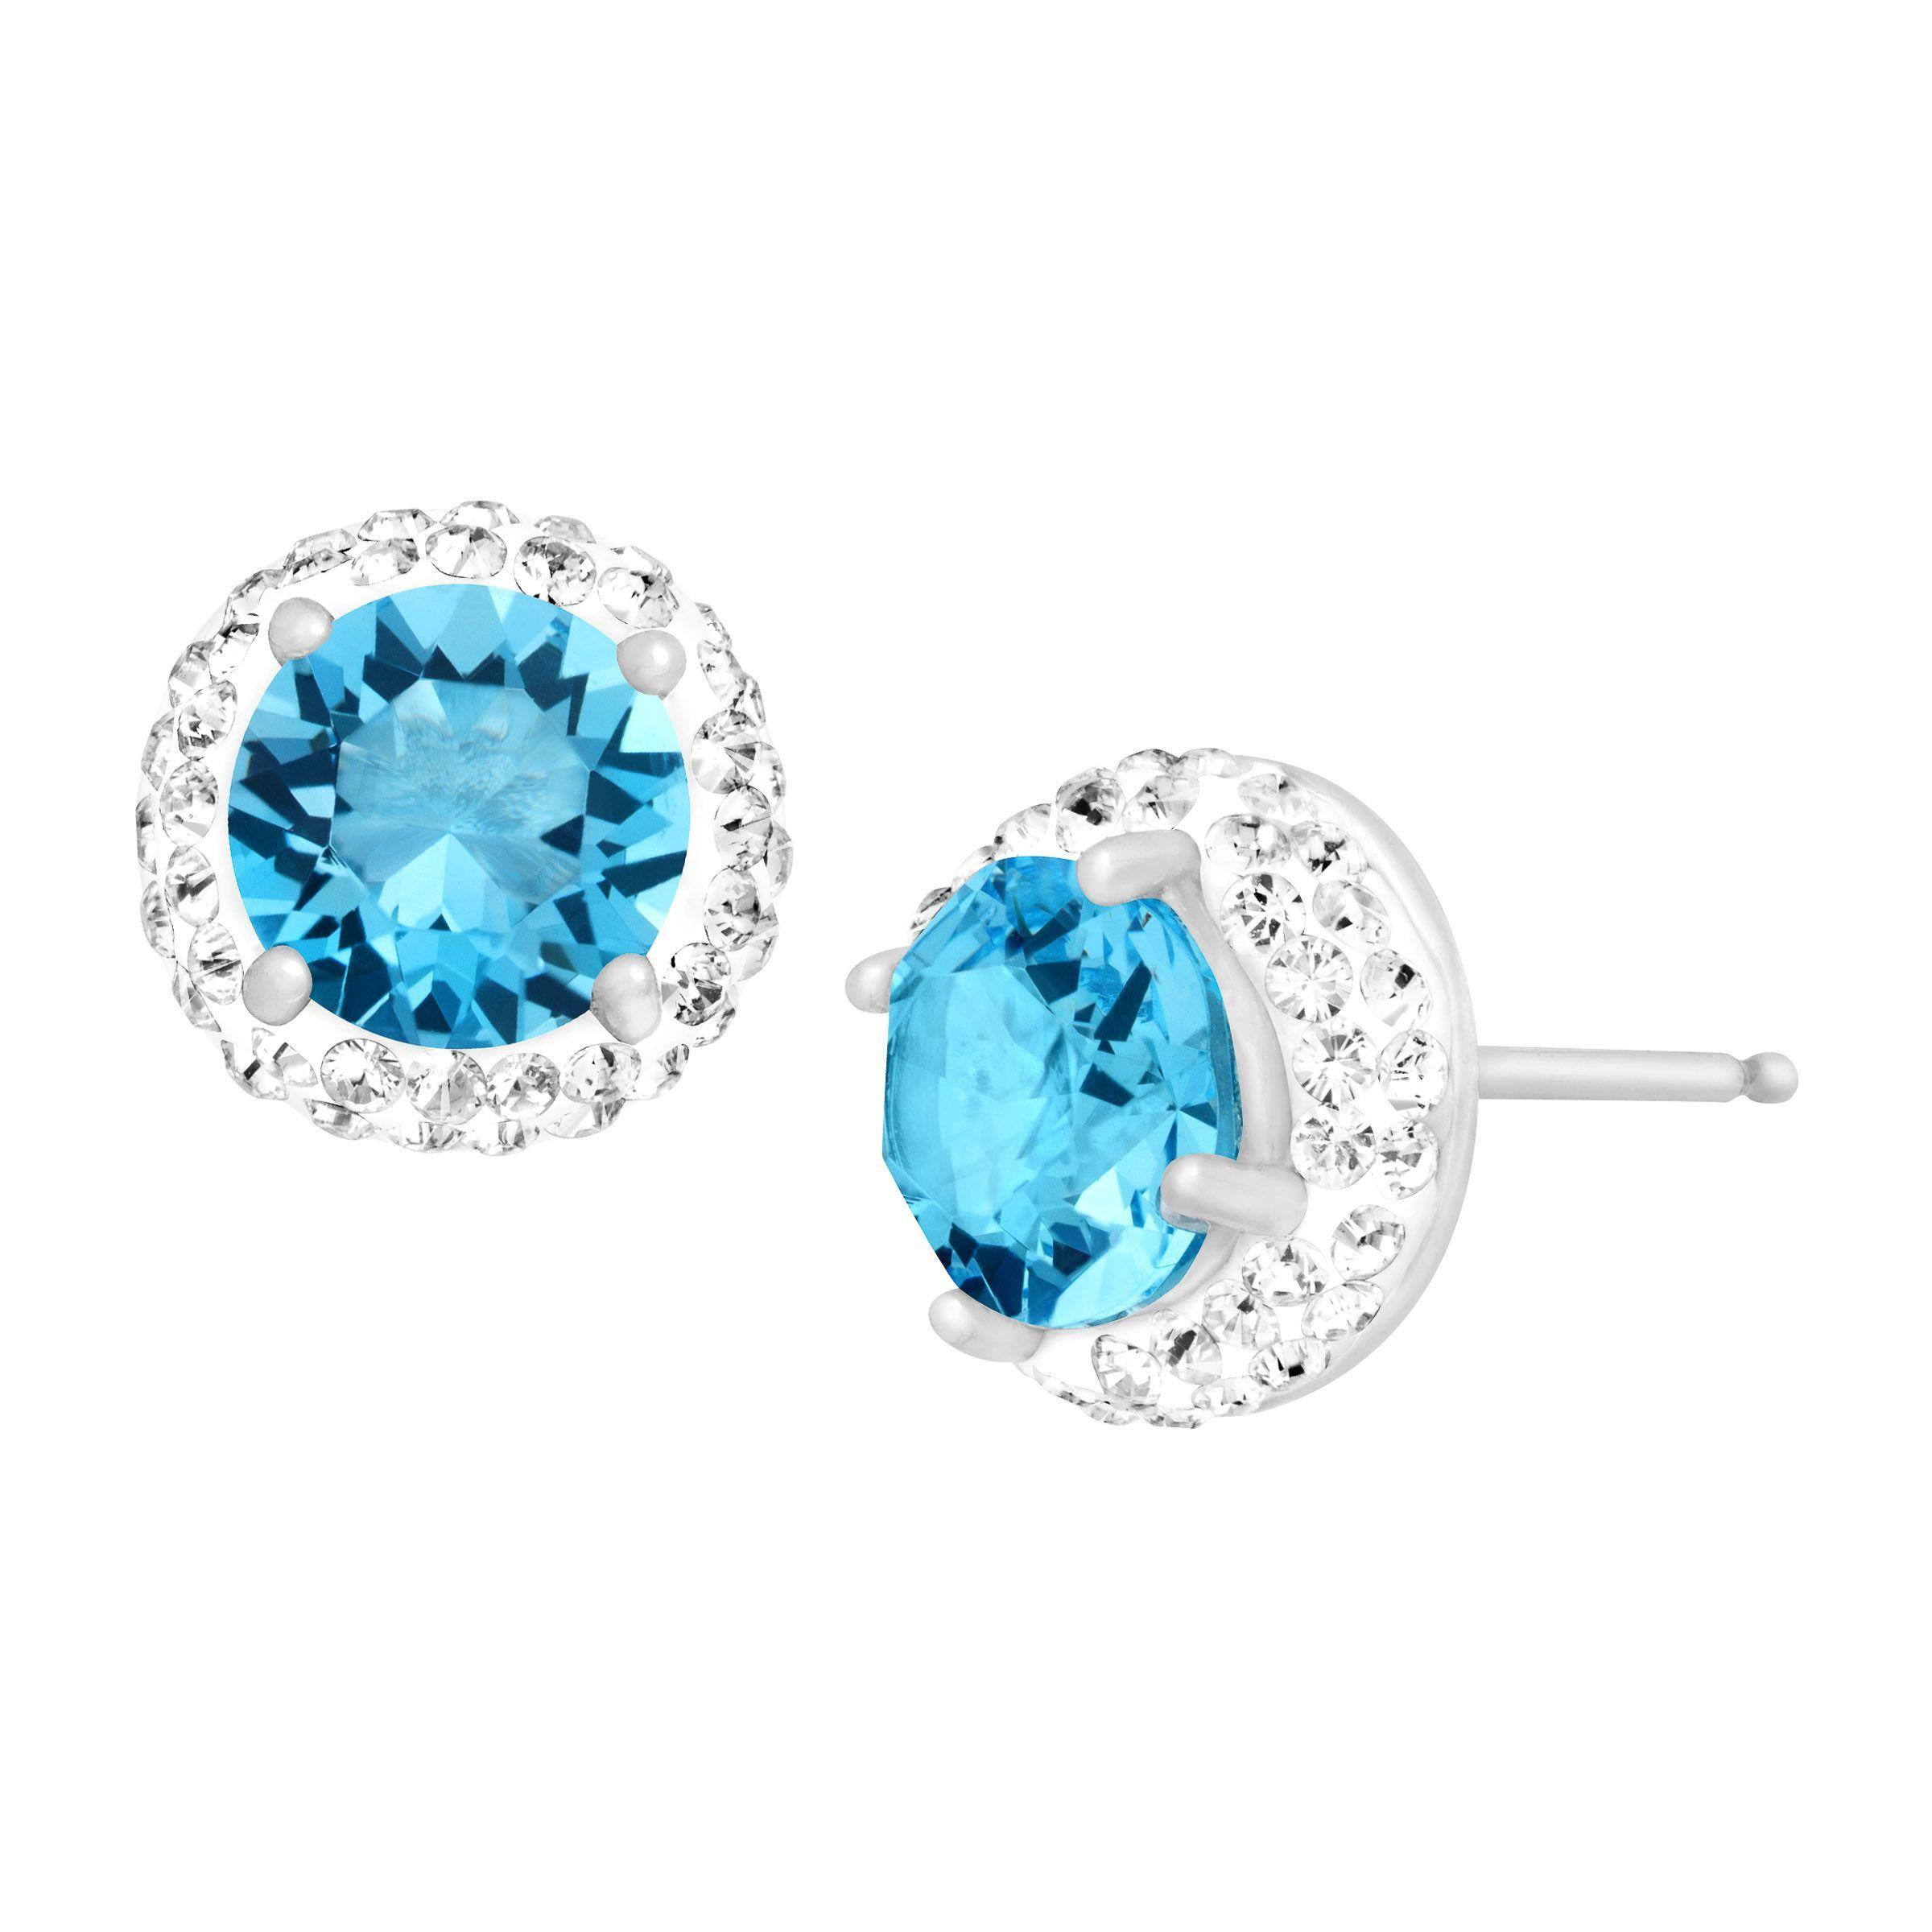 Crystaluxe March Earrings With Light Blue Swarovski